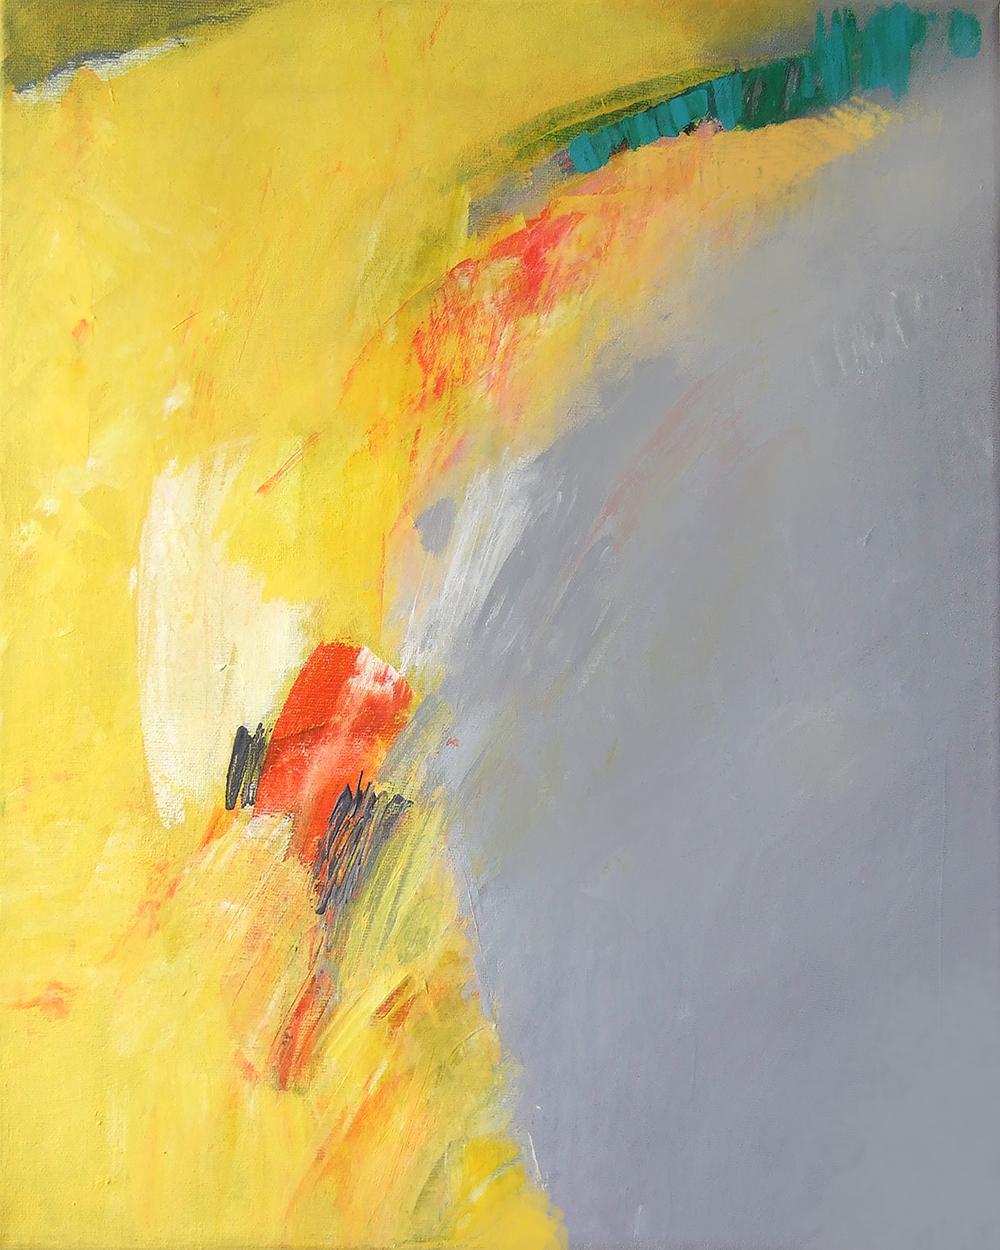 Gelb und Grau30x24 cm